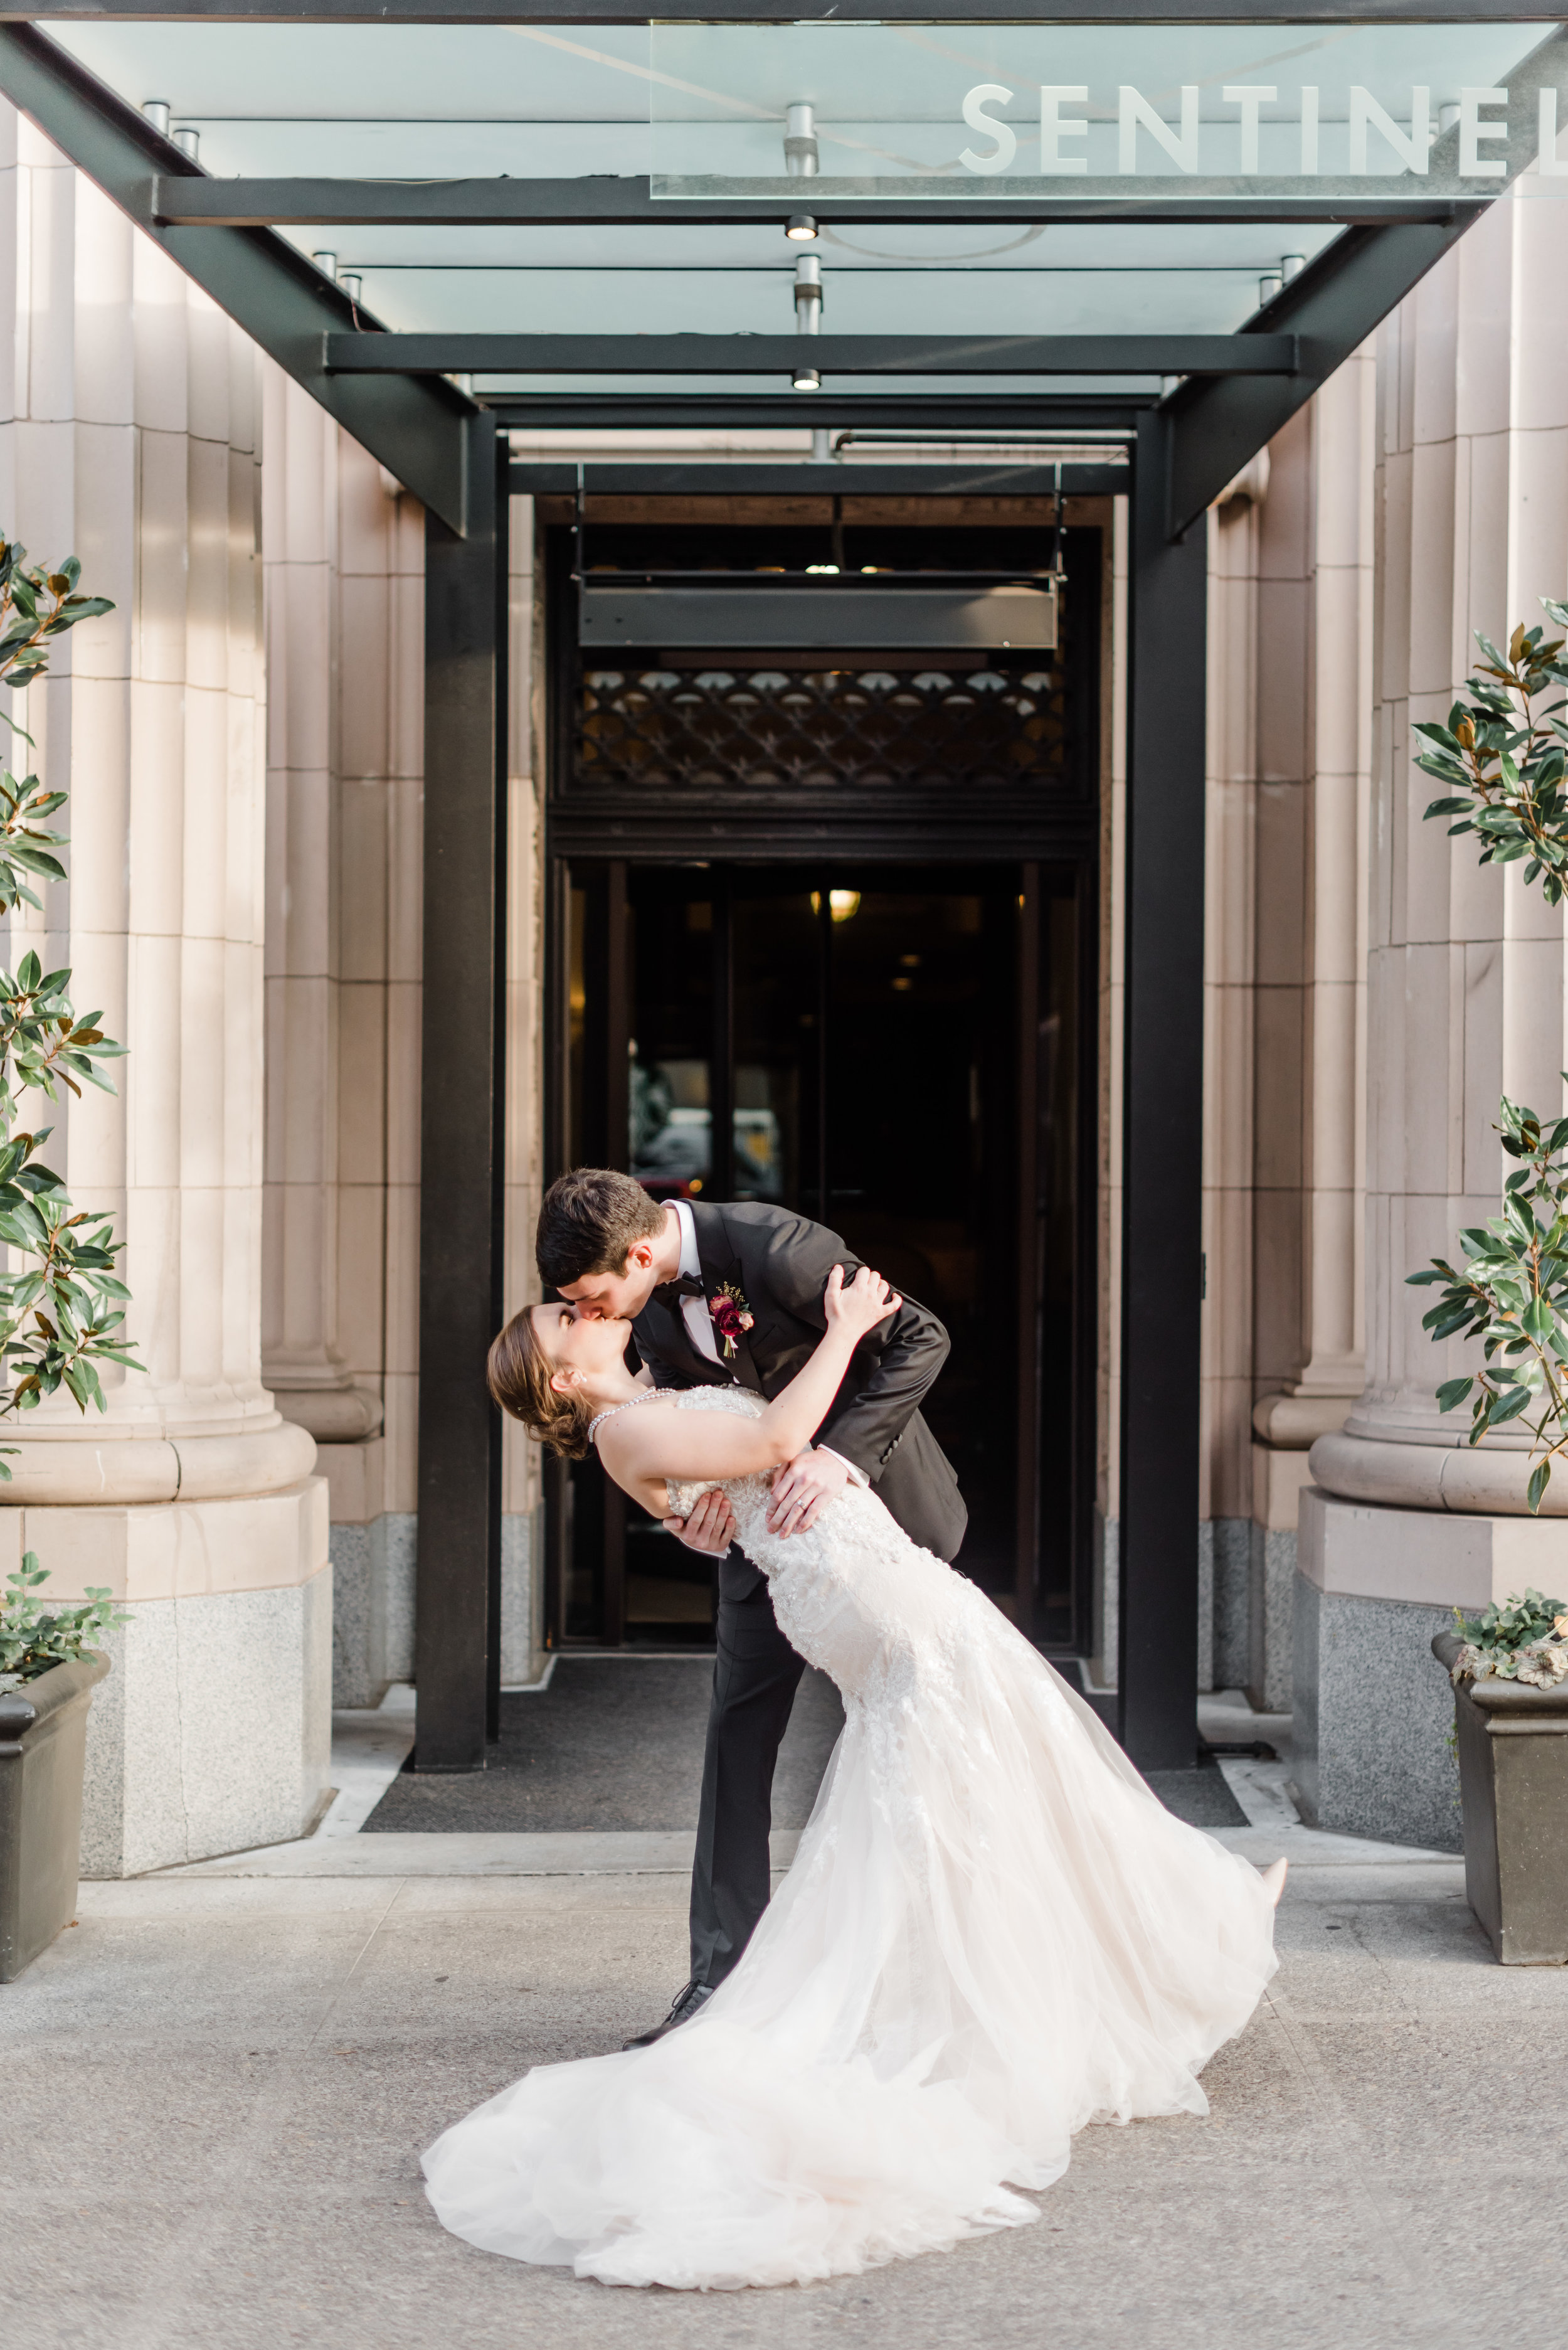 Wedding portrait at Sentinel Hotel